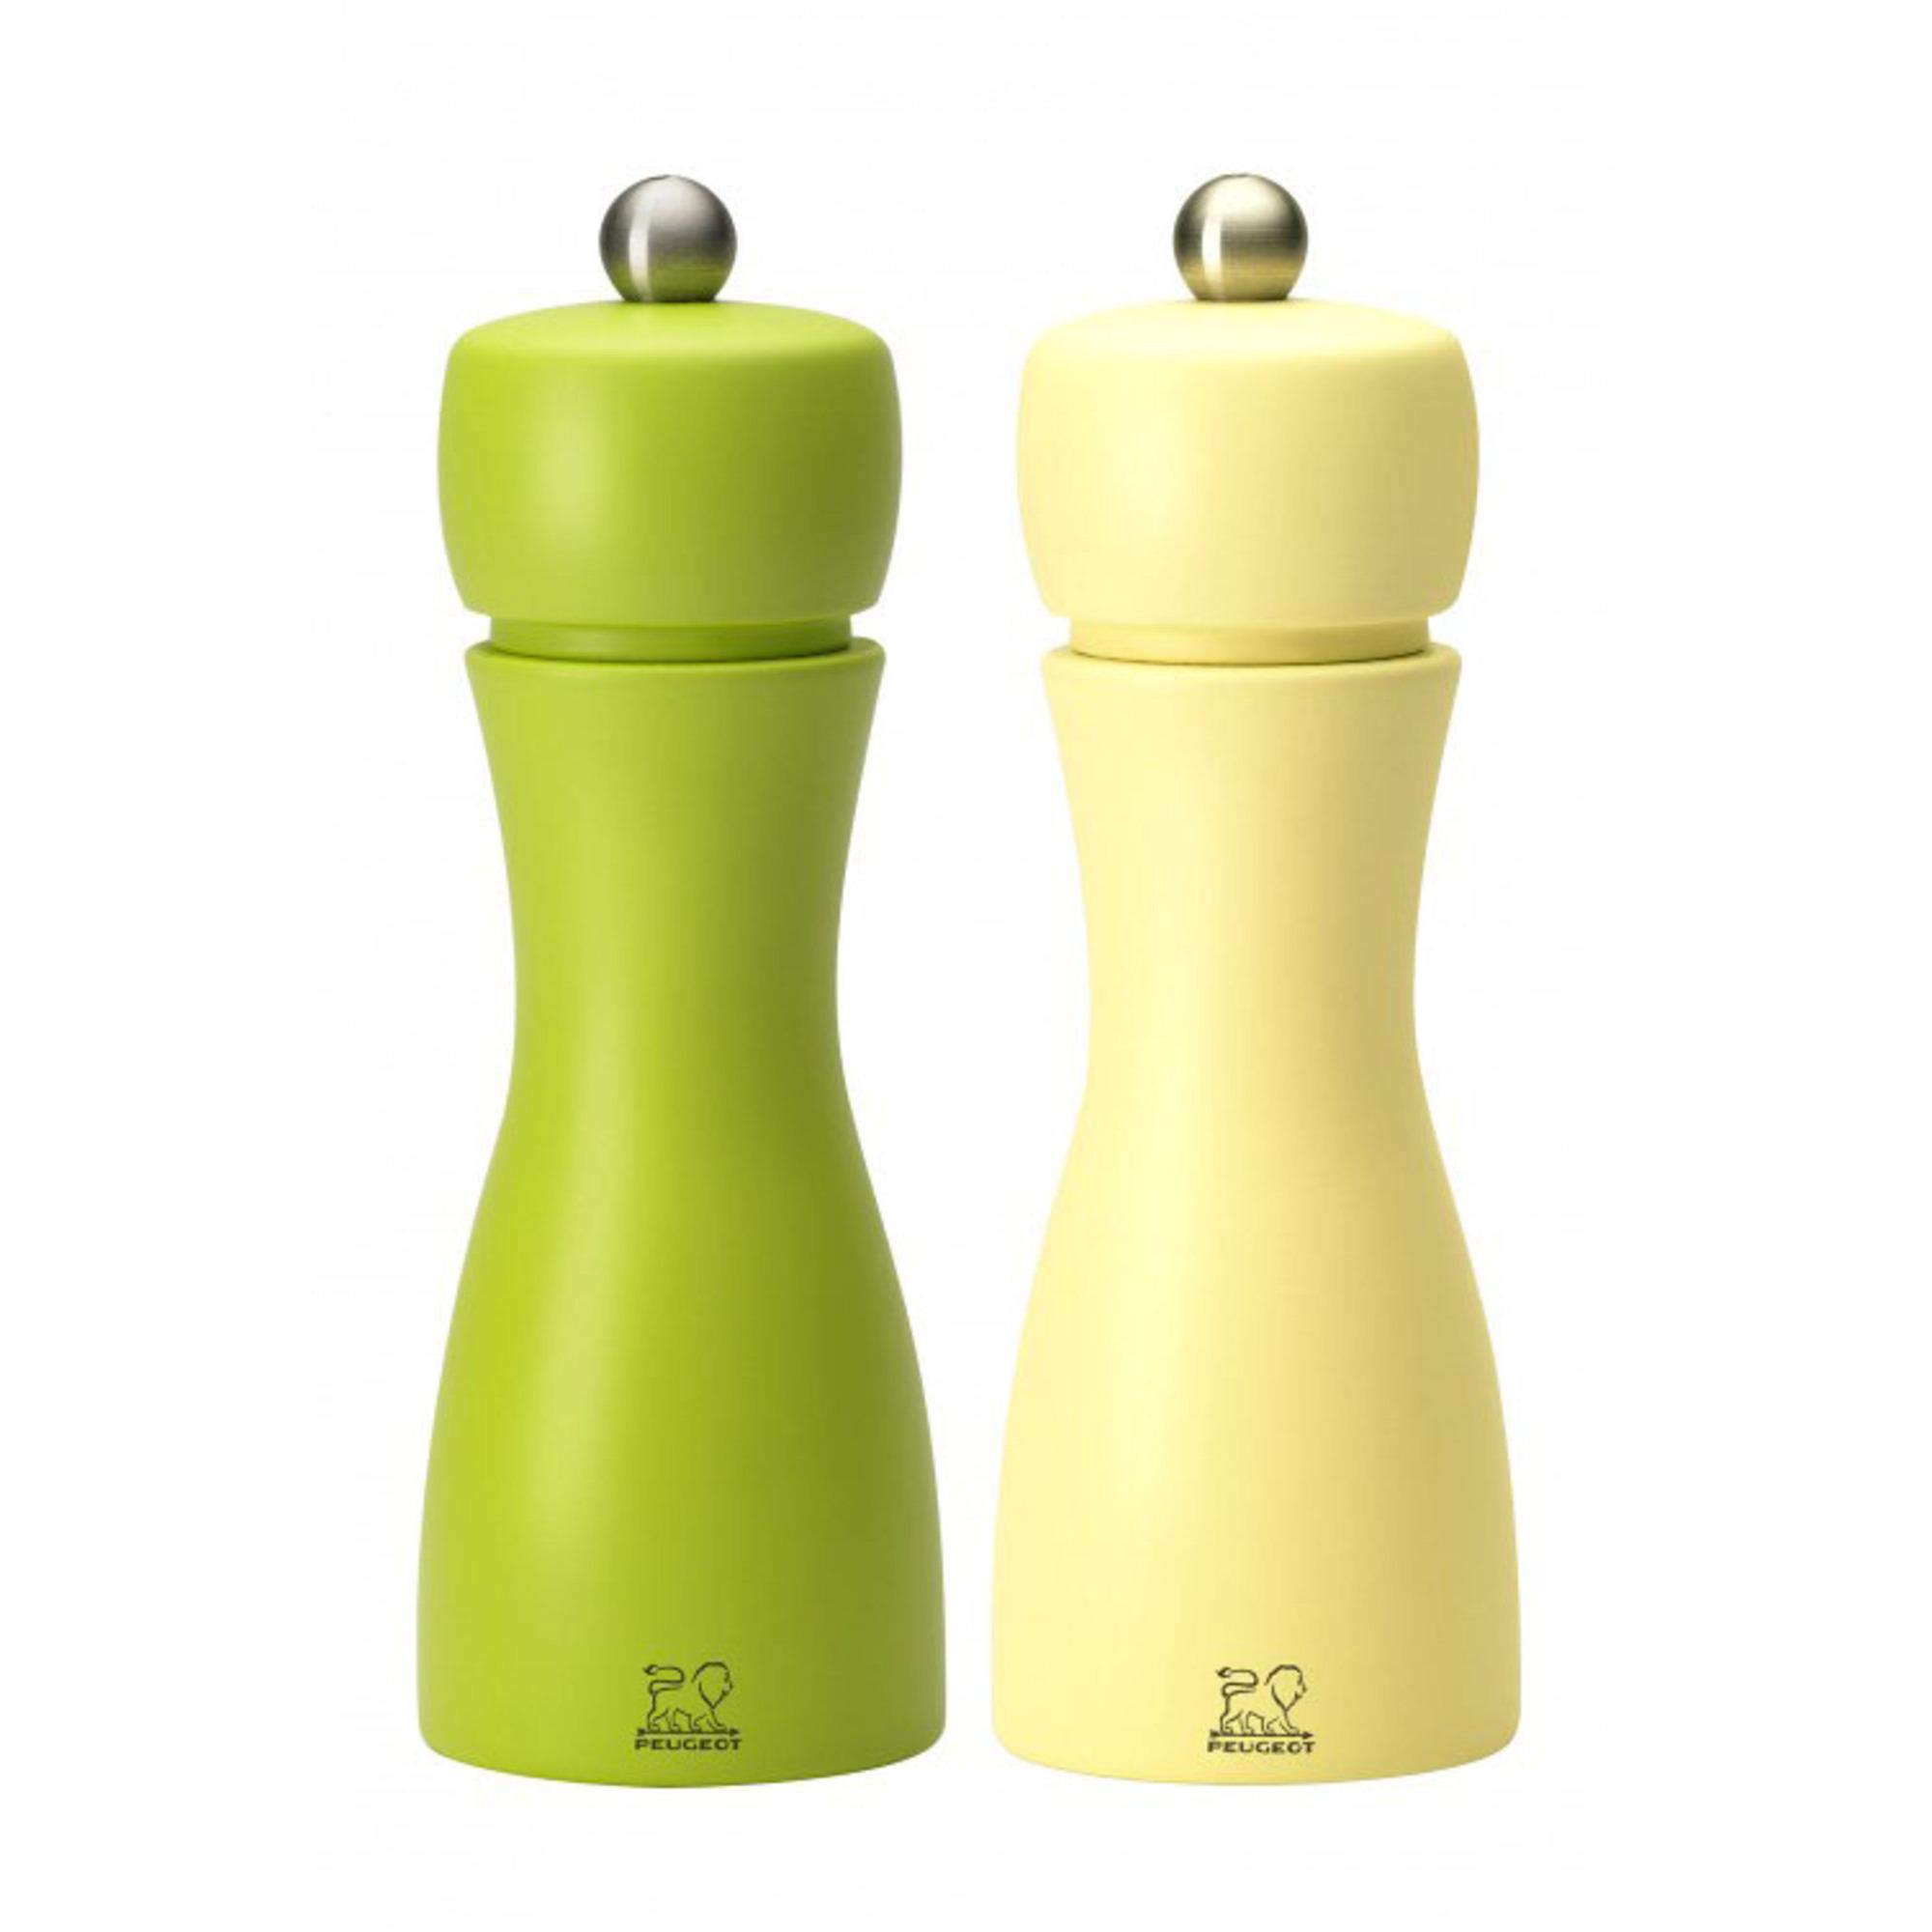 Peugeot Tahiti Duo Salt & Pepparkvarnar 15 cm Vår